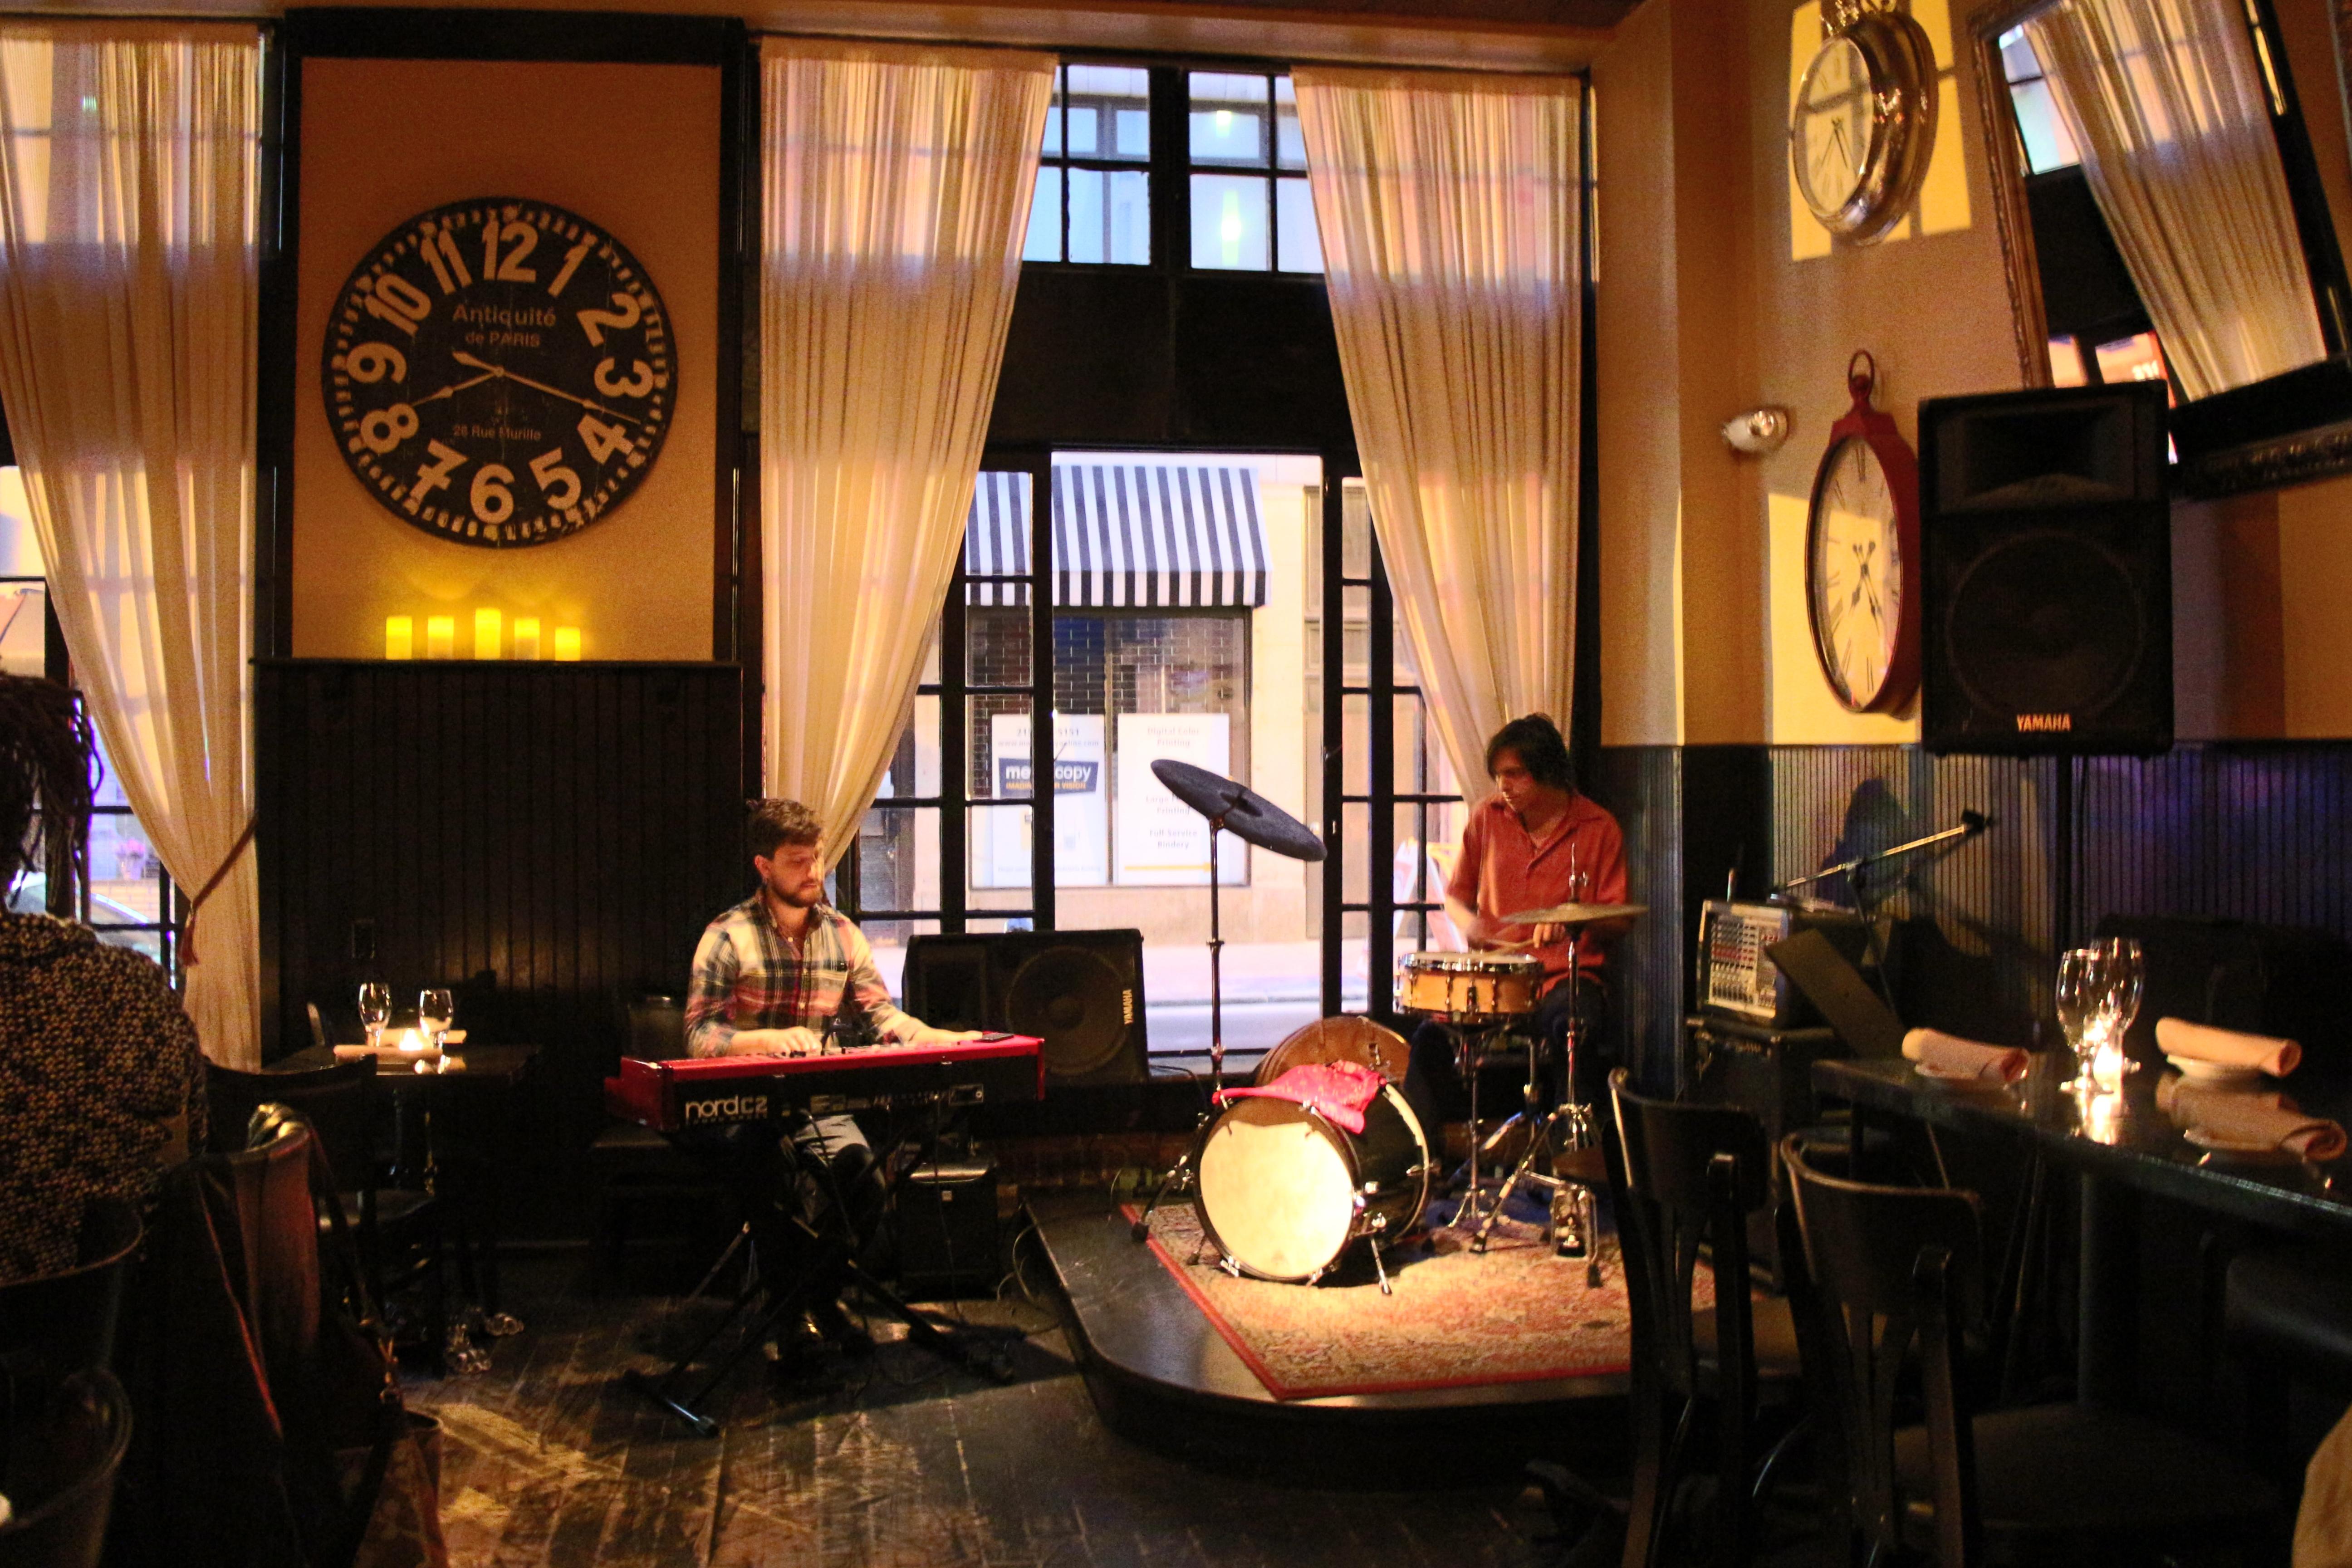 Jazz Center Restaurant The 2015 Center City Jazz